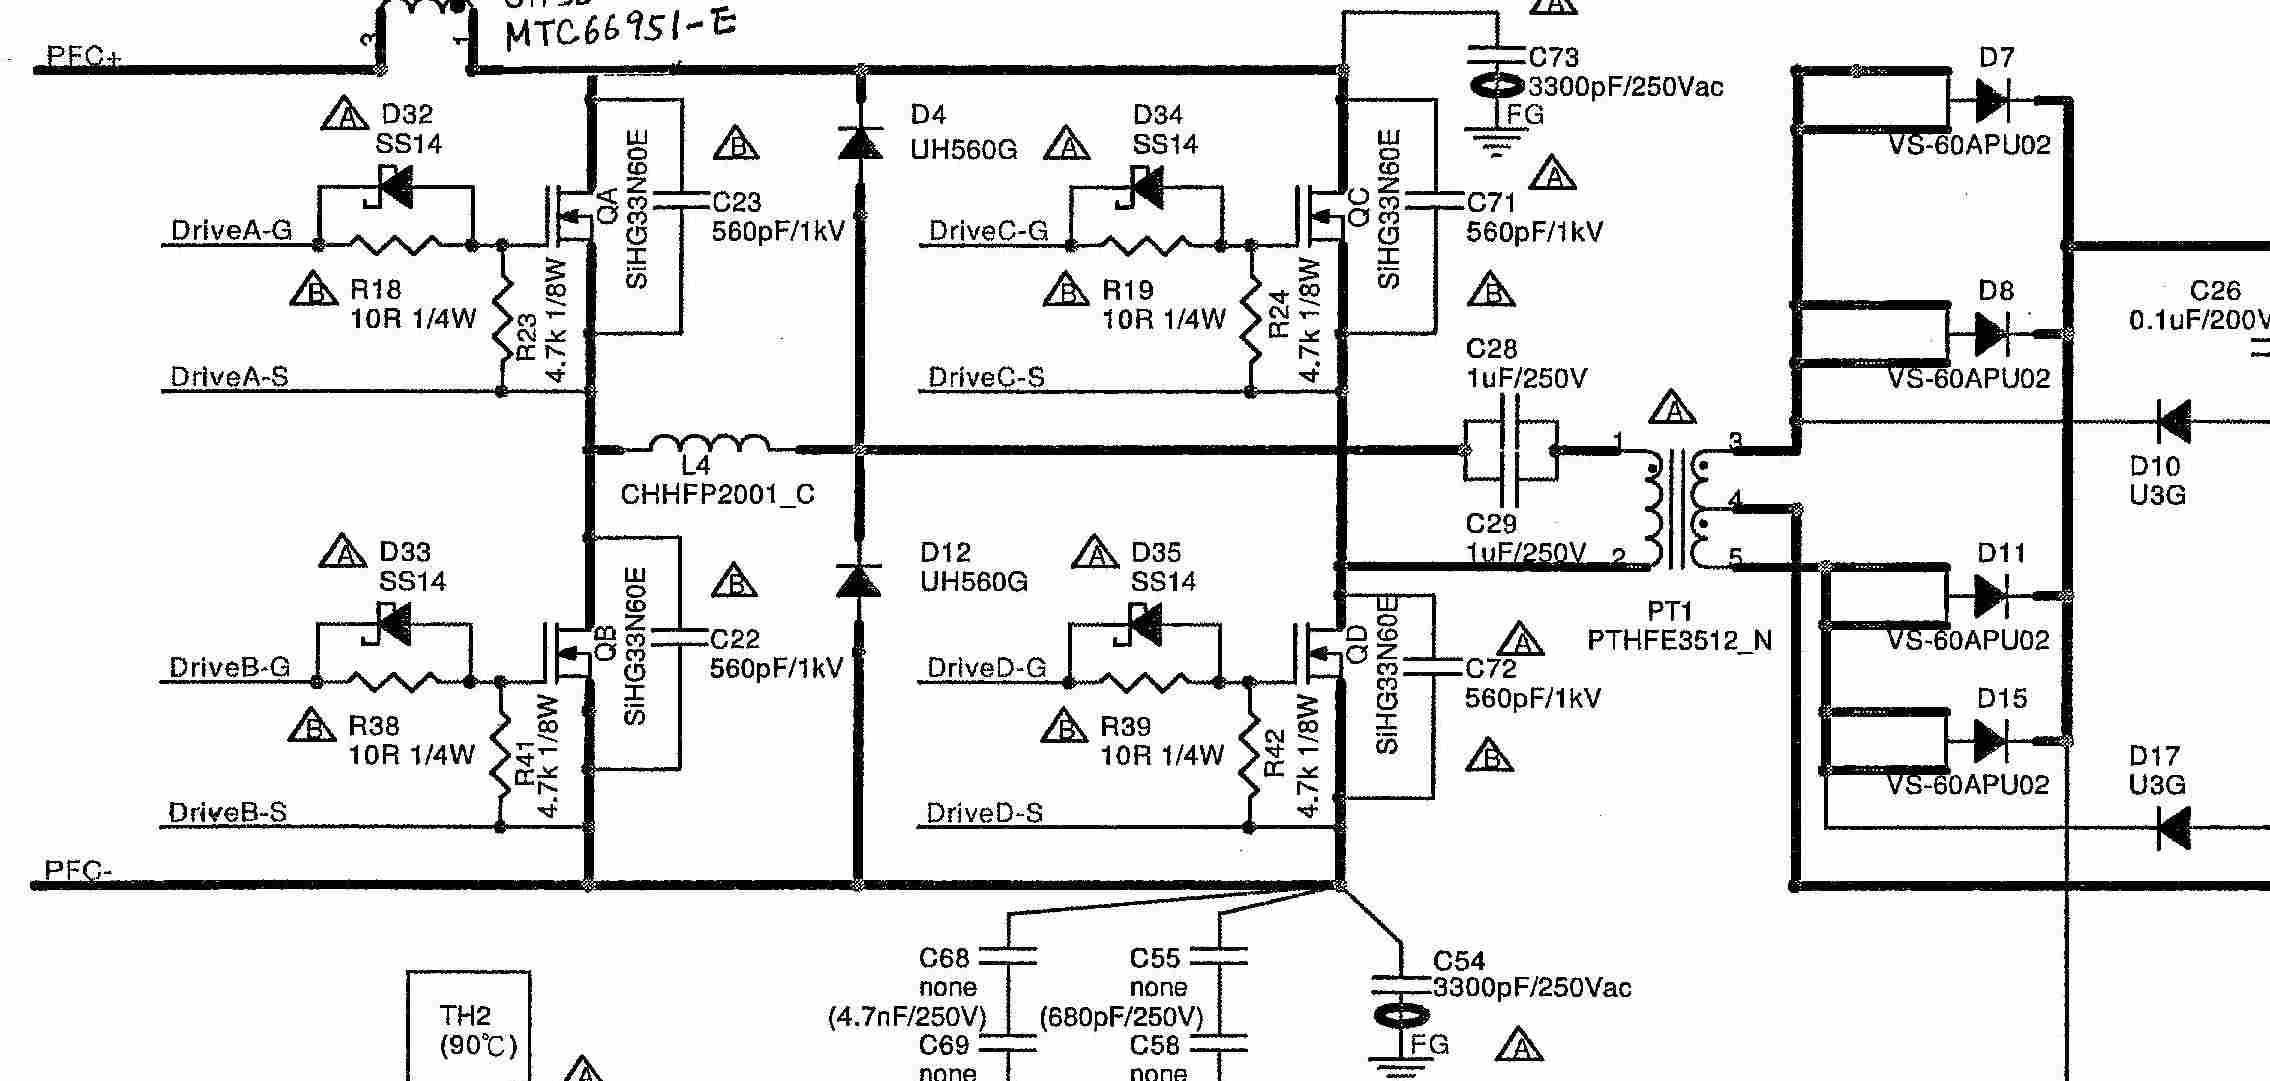 Charming Ng1 Ev Wiring Diagram Dc Gallery - Best Image Diagram ...